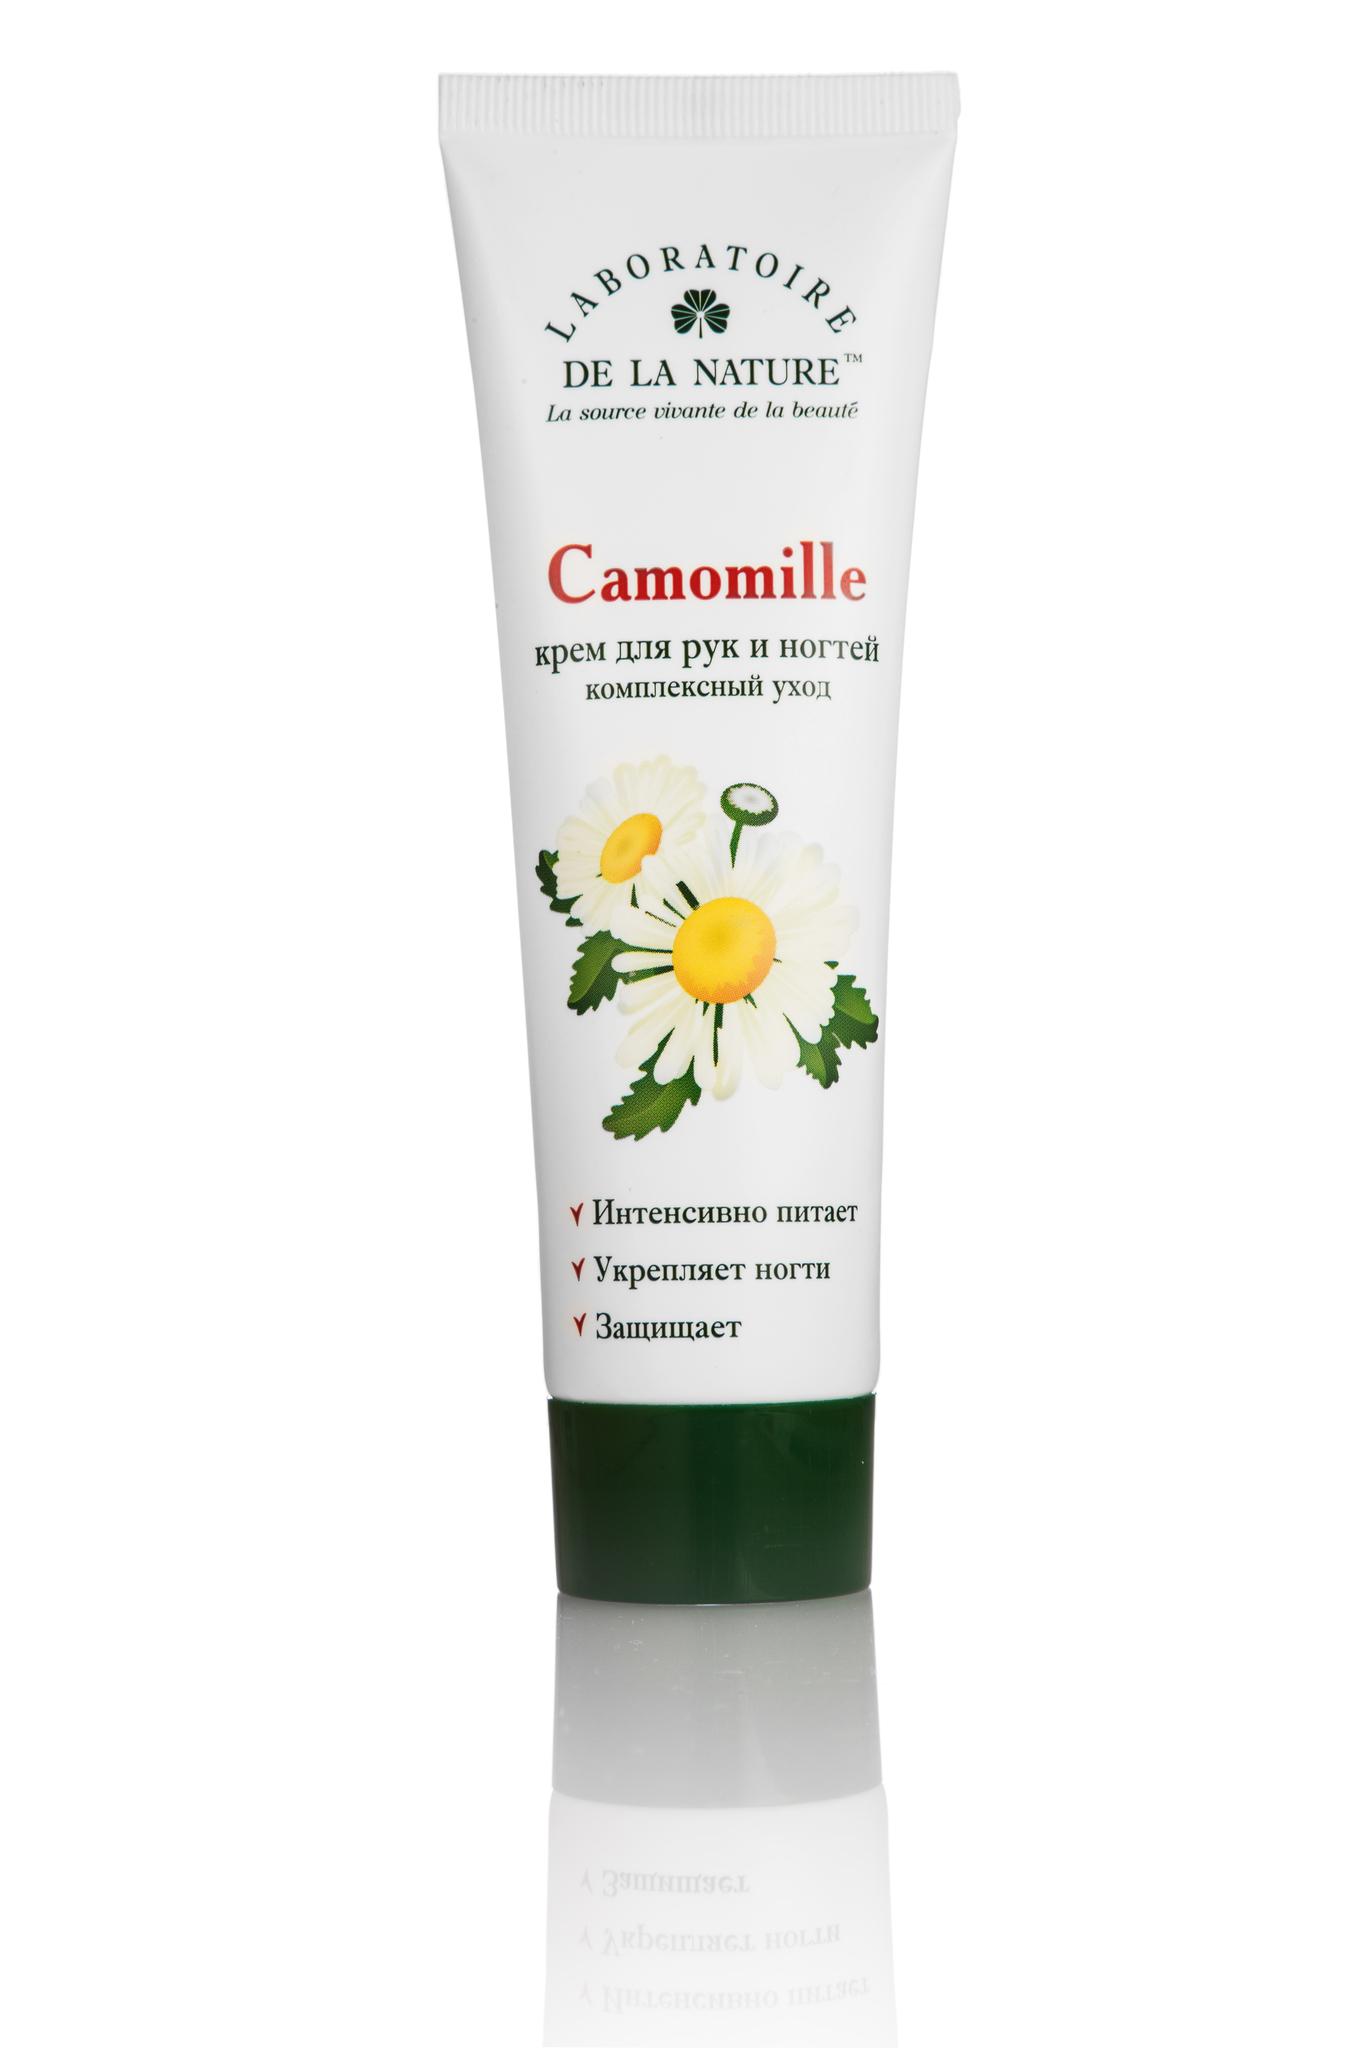 Camomille крем для рук и ногтей 100 мл.